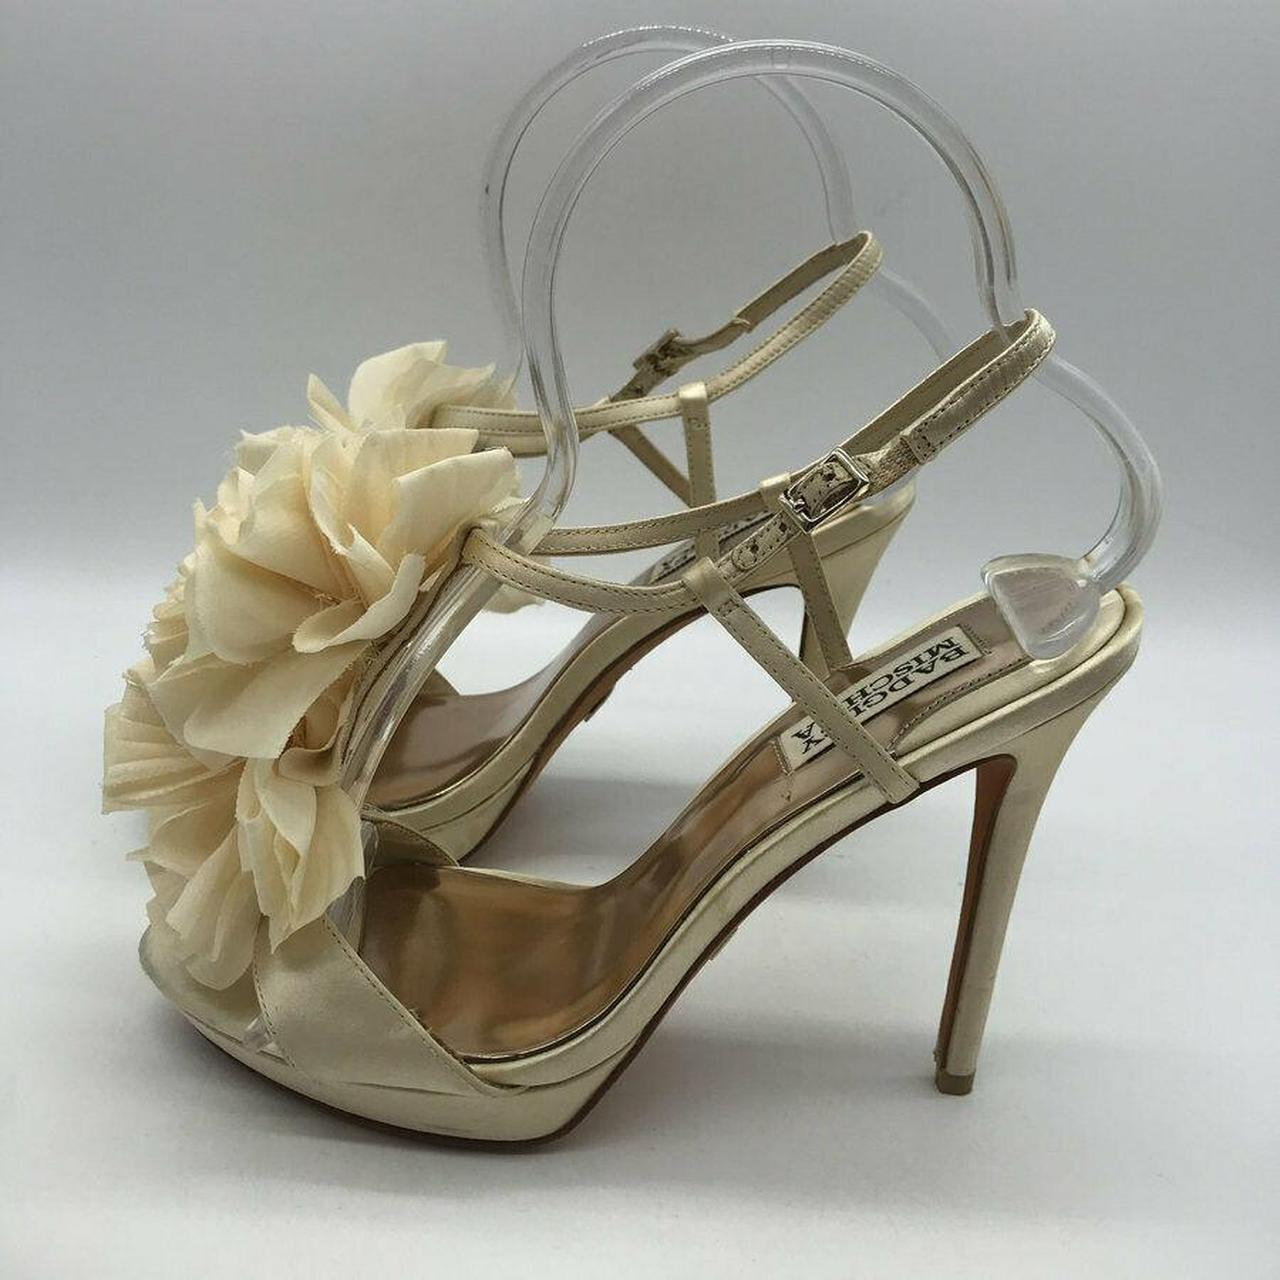 Product Image 1 - Badgley Mischka Ivory Slingback Heels